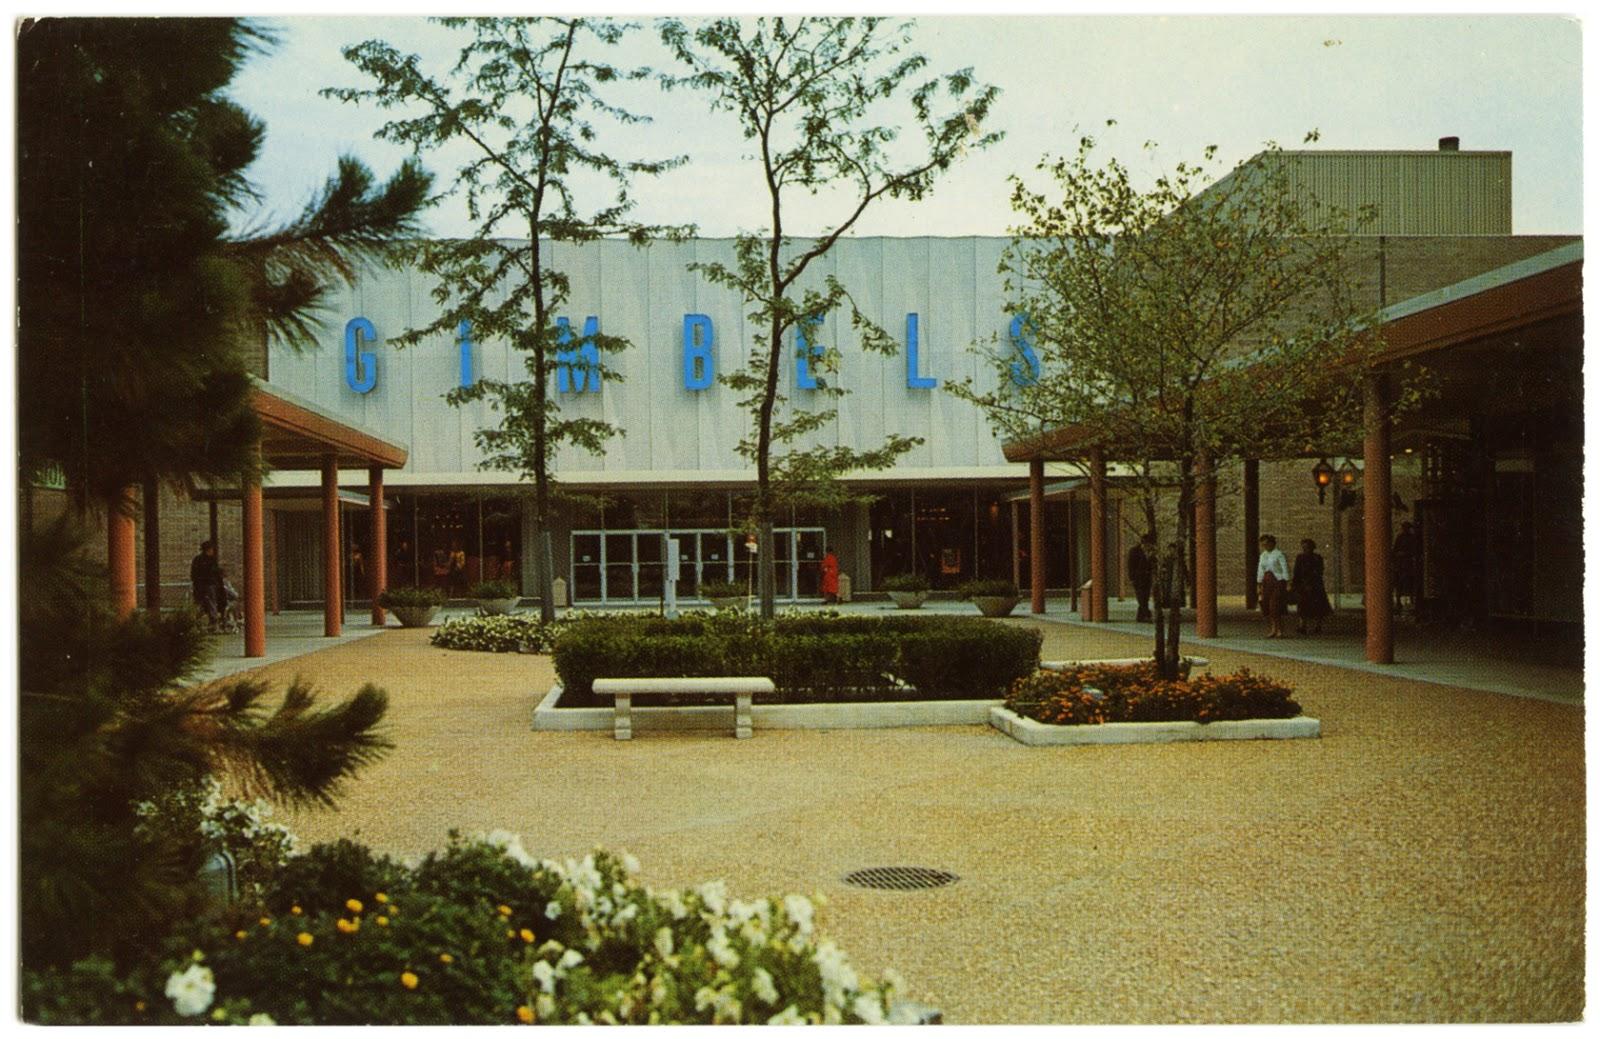 mayfair mall - photo #43